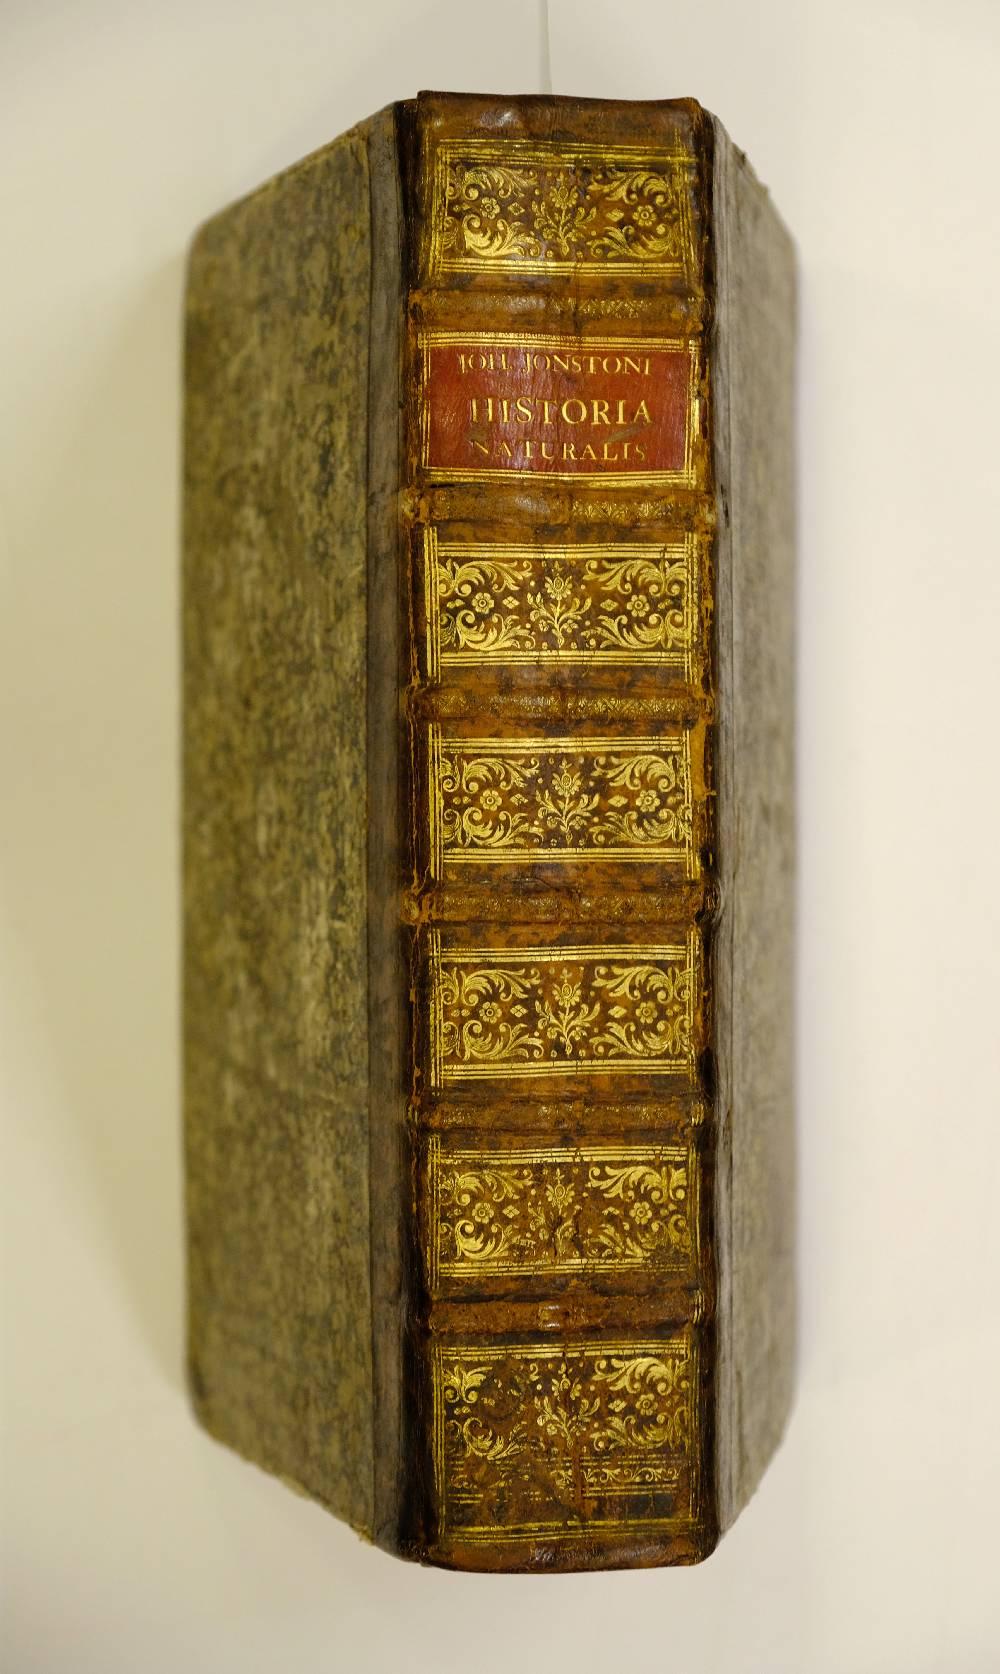 Lot 32 - Jonston (John). Historiae Naturalis de Quadrupedibus... de Serpentibus... de Insectis... de